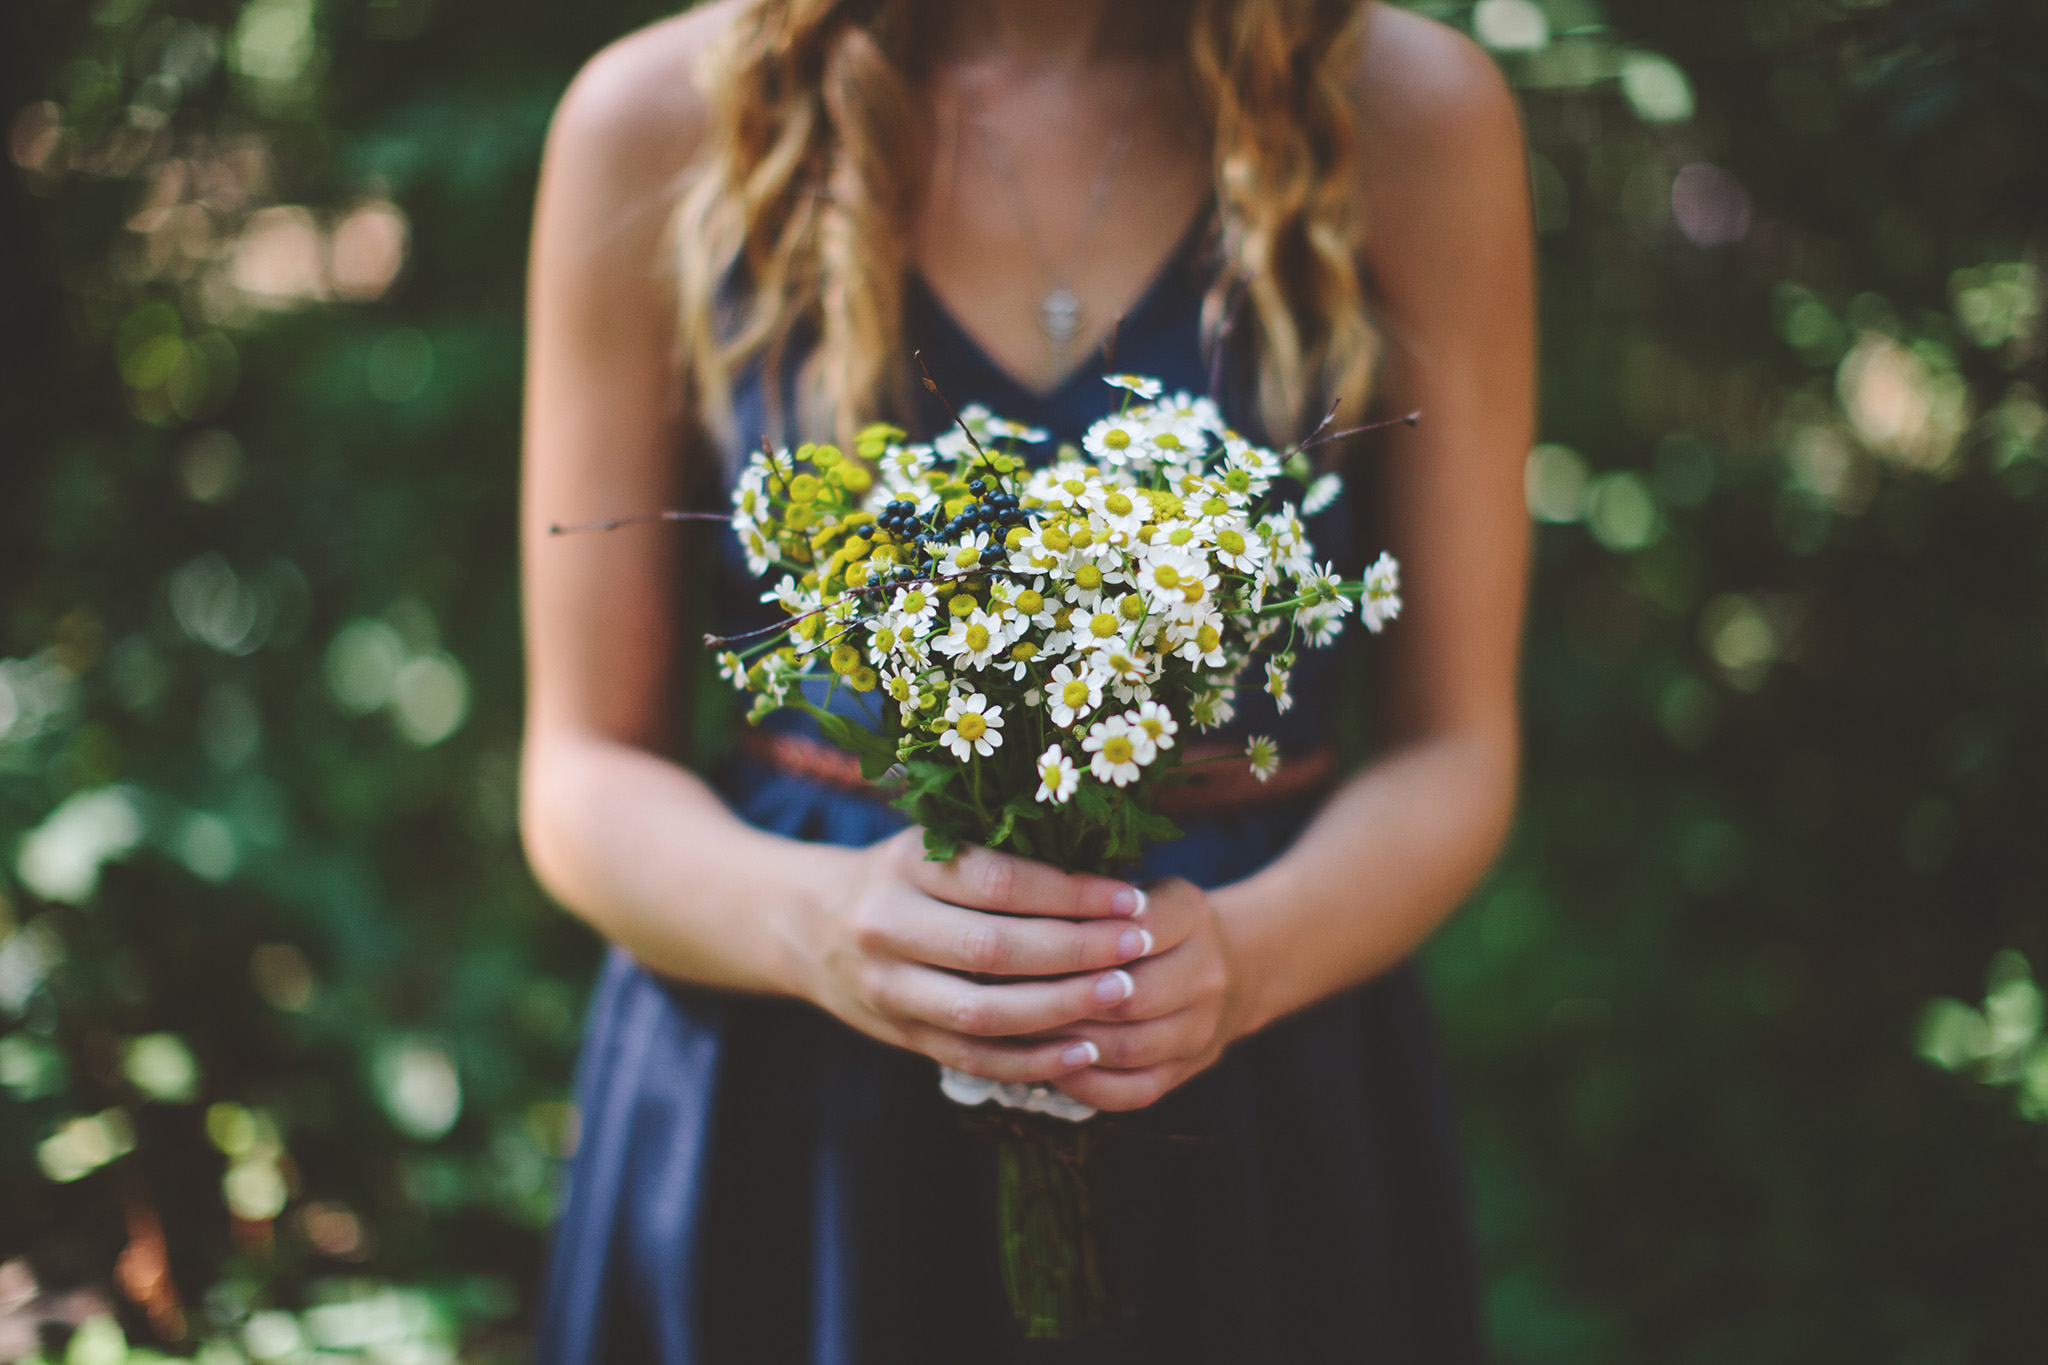 the-bees-knees-floral-design-studio-brainerd-mn-minnesota-wedding-florist-bride-sharayah-wildflower-wedding-boutonniere-the-shalom-imaginative